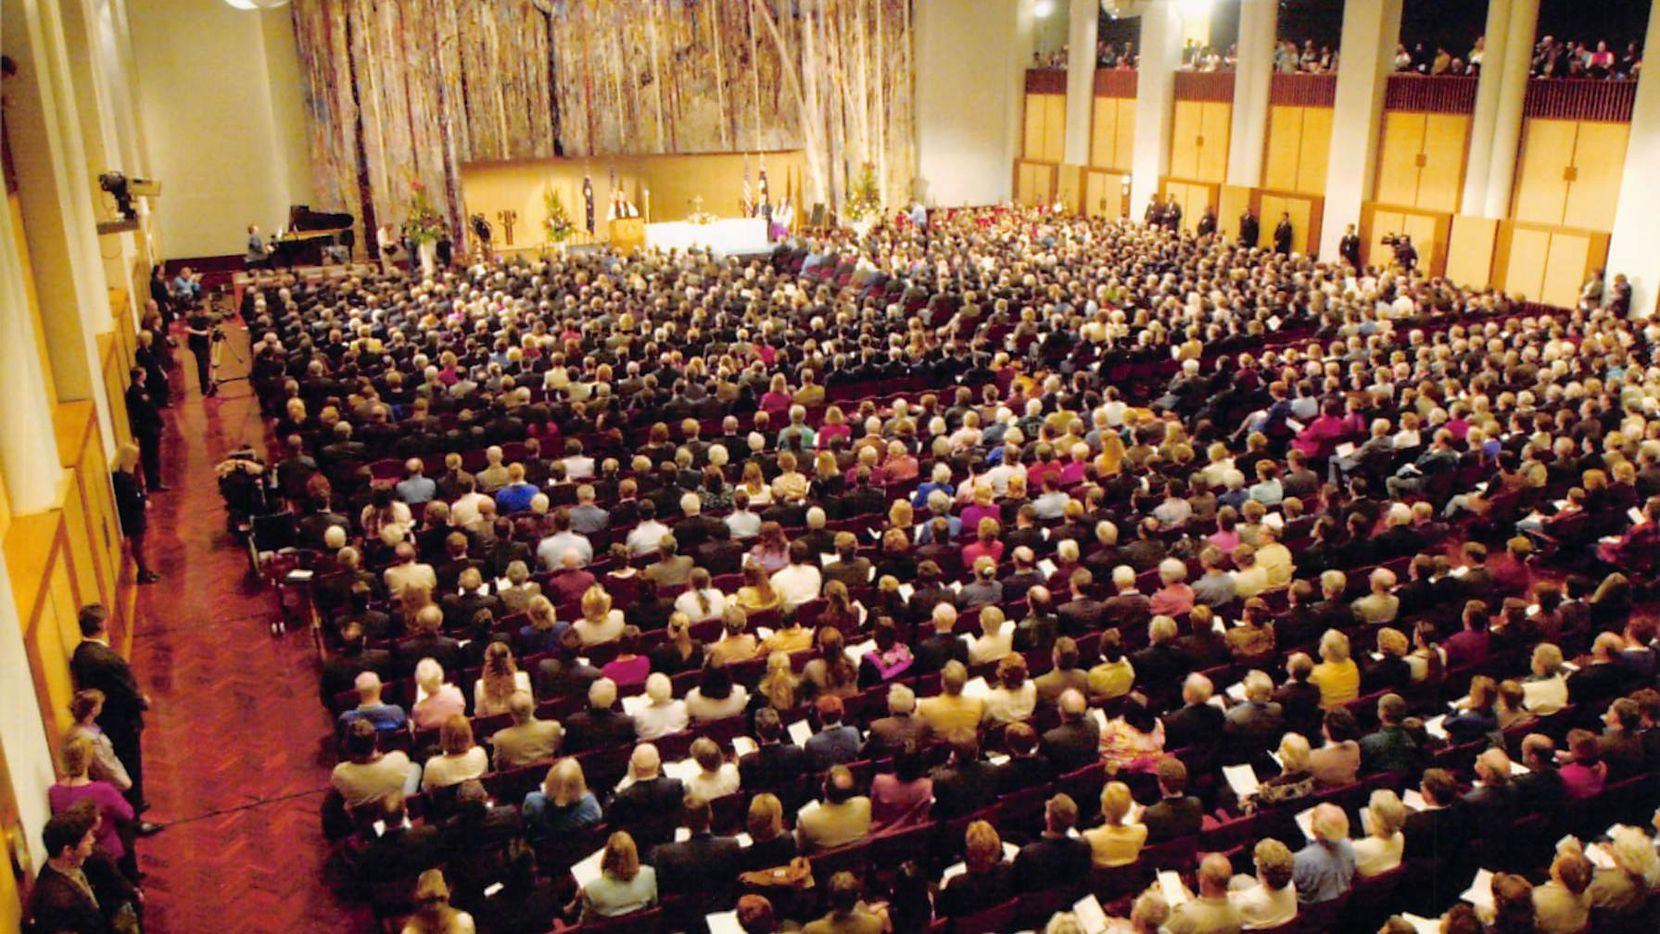 Former Ambassador Tom Schieffer spoke at a memorial service in Australia shortly after 9/11.